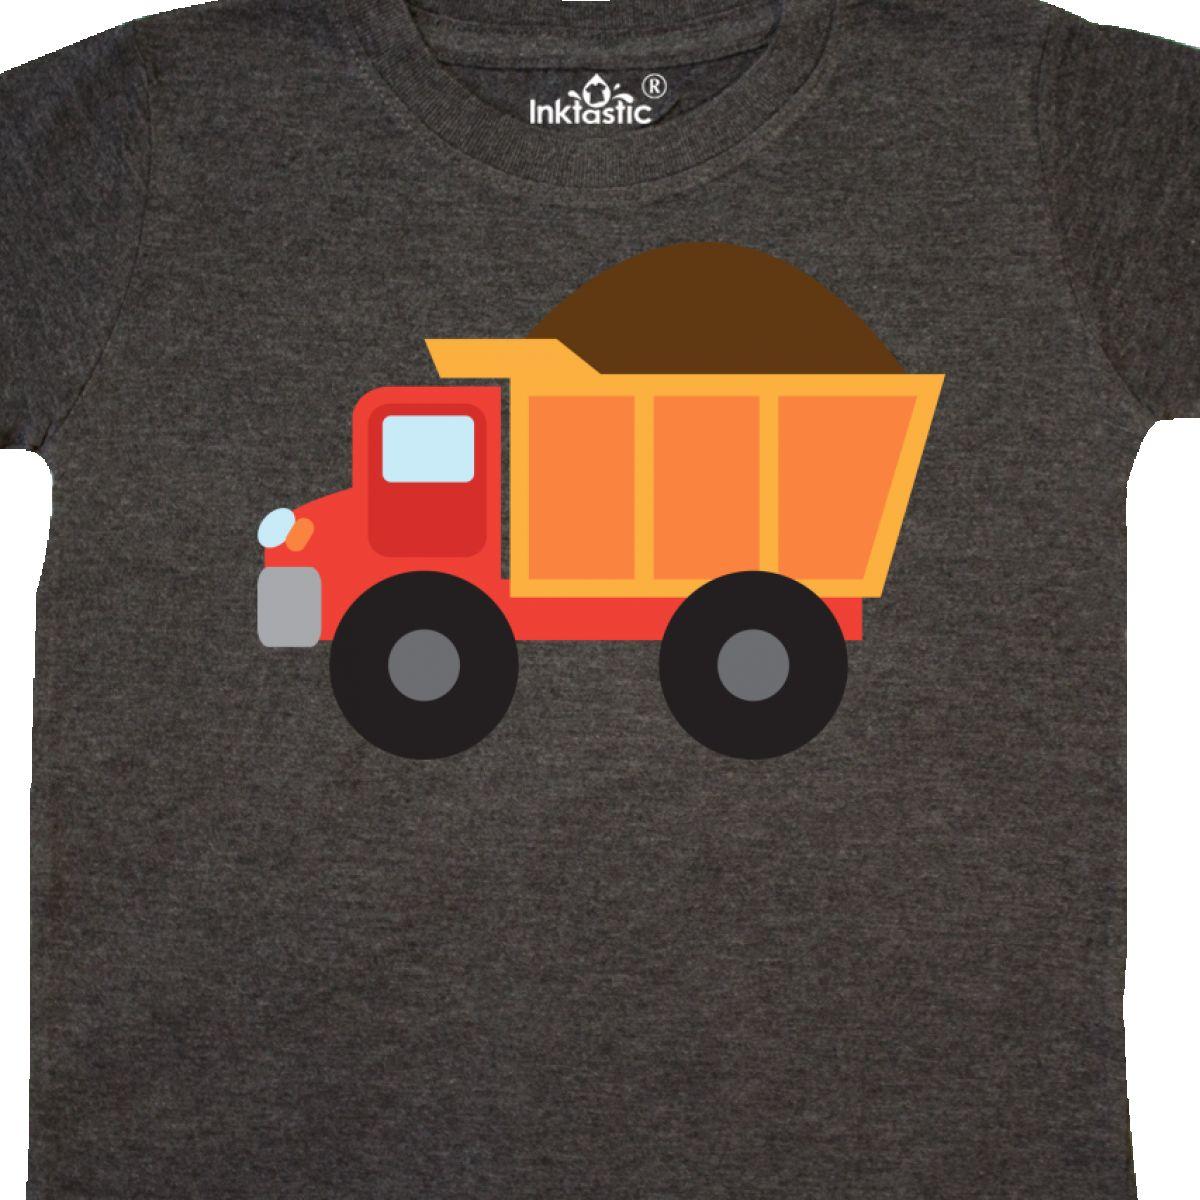 Inktastic-Work-Truck-Construction-Vehicle-Toddler-T-Shirt-Trucks-Vehicles-Cute thumbnail 32